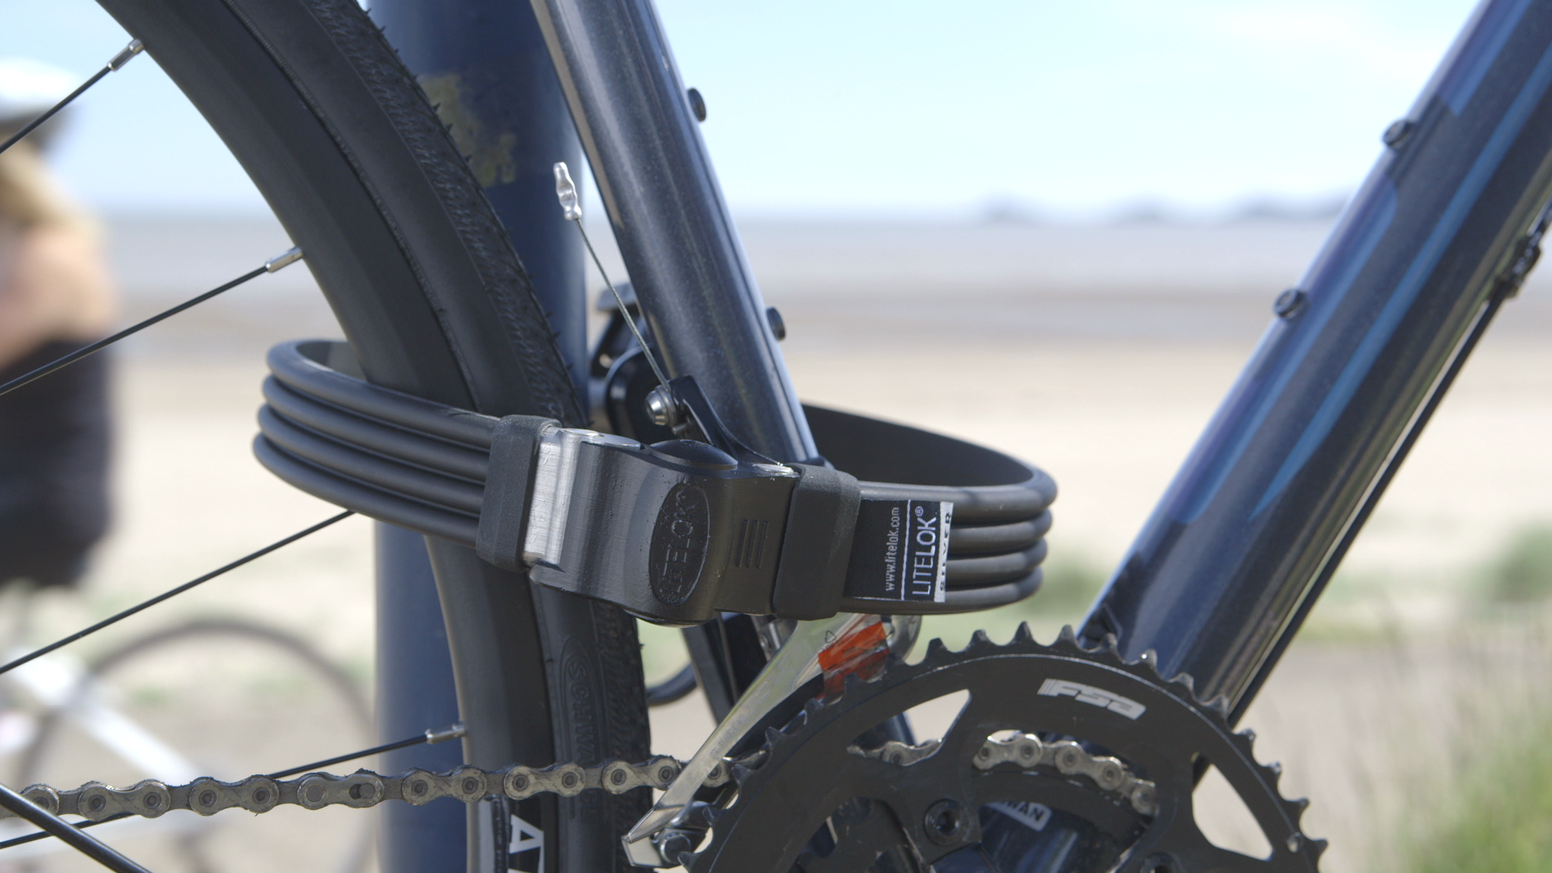 a0dda187f41 A premium, flexible, easy to use bike lock, made in Britain using cutting